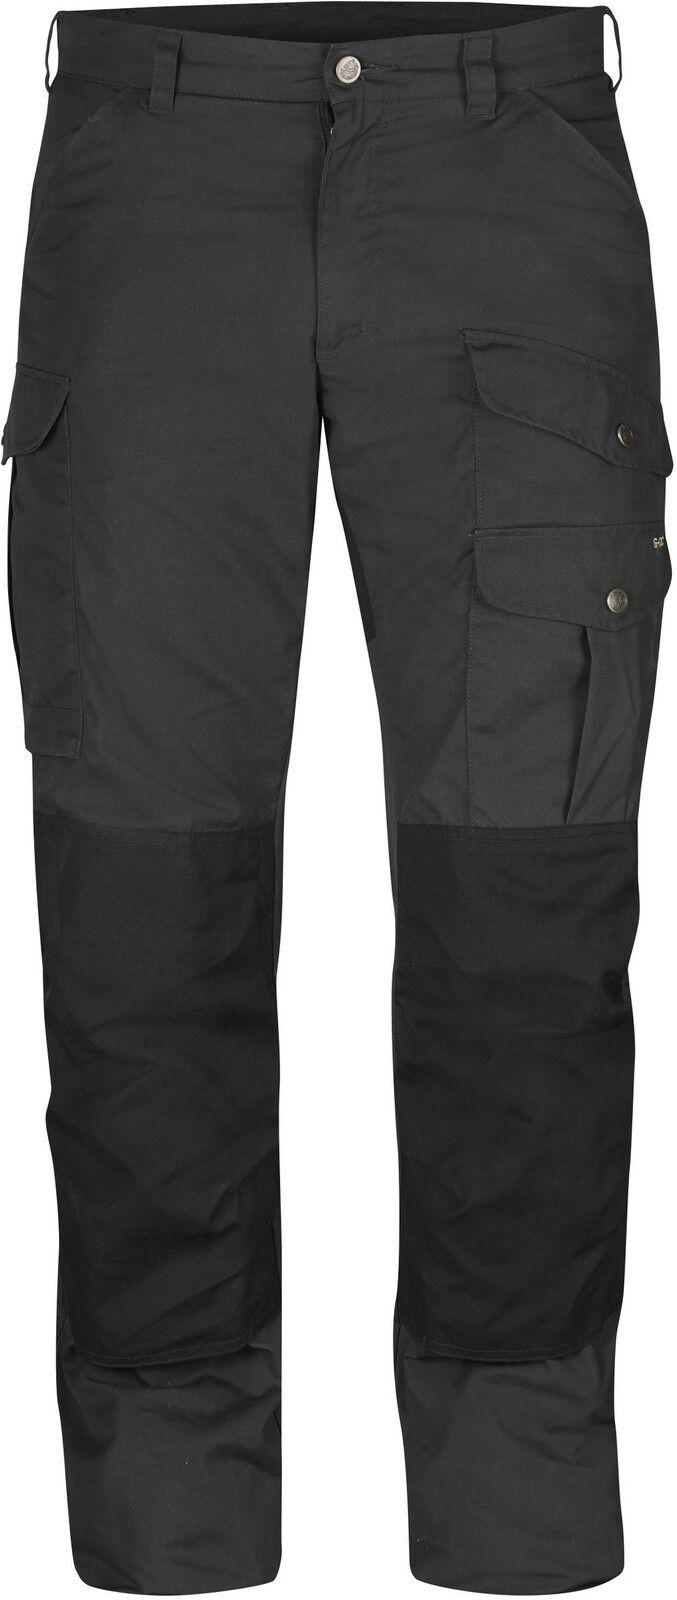 Fjäll Räven Barents Pro Winter Outdoorhose Trekkinghose 81144 Gr.48 Dark Grau